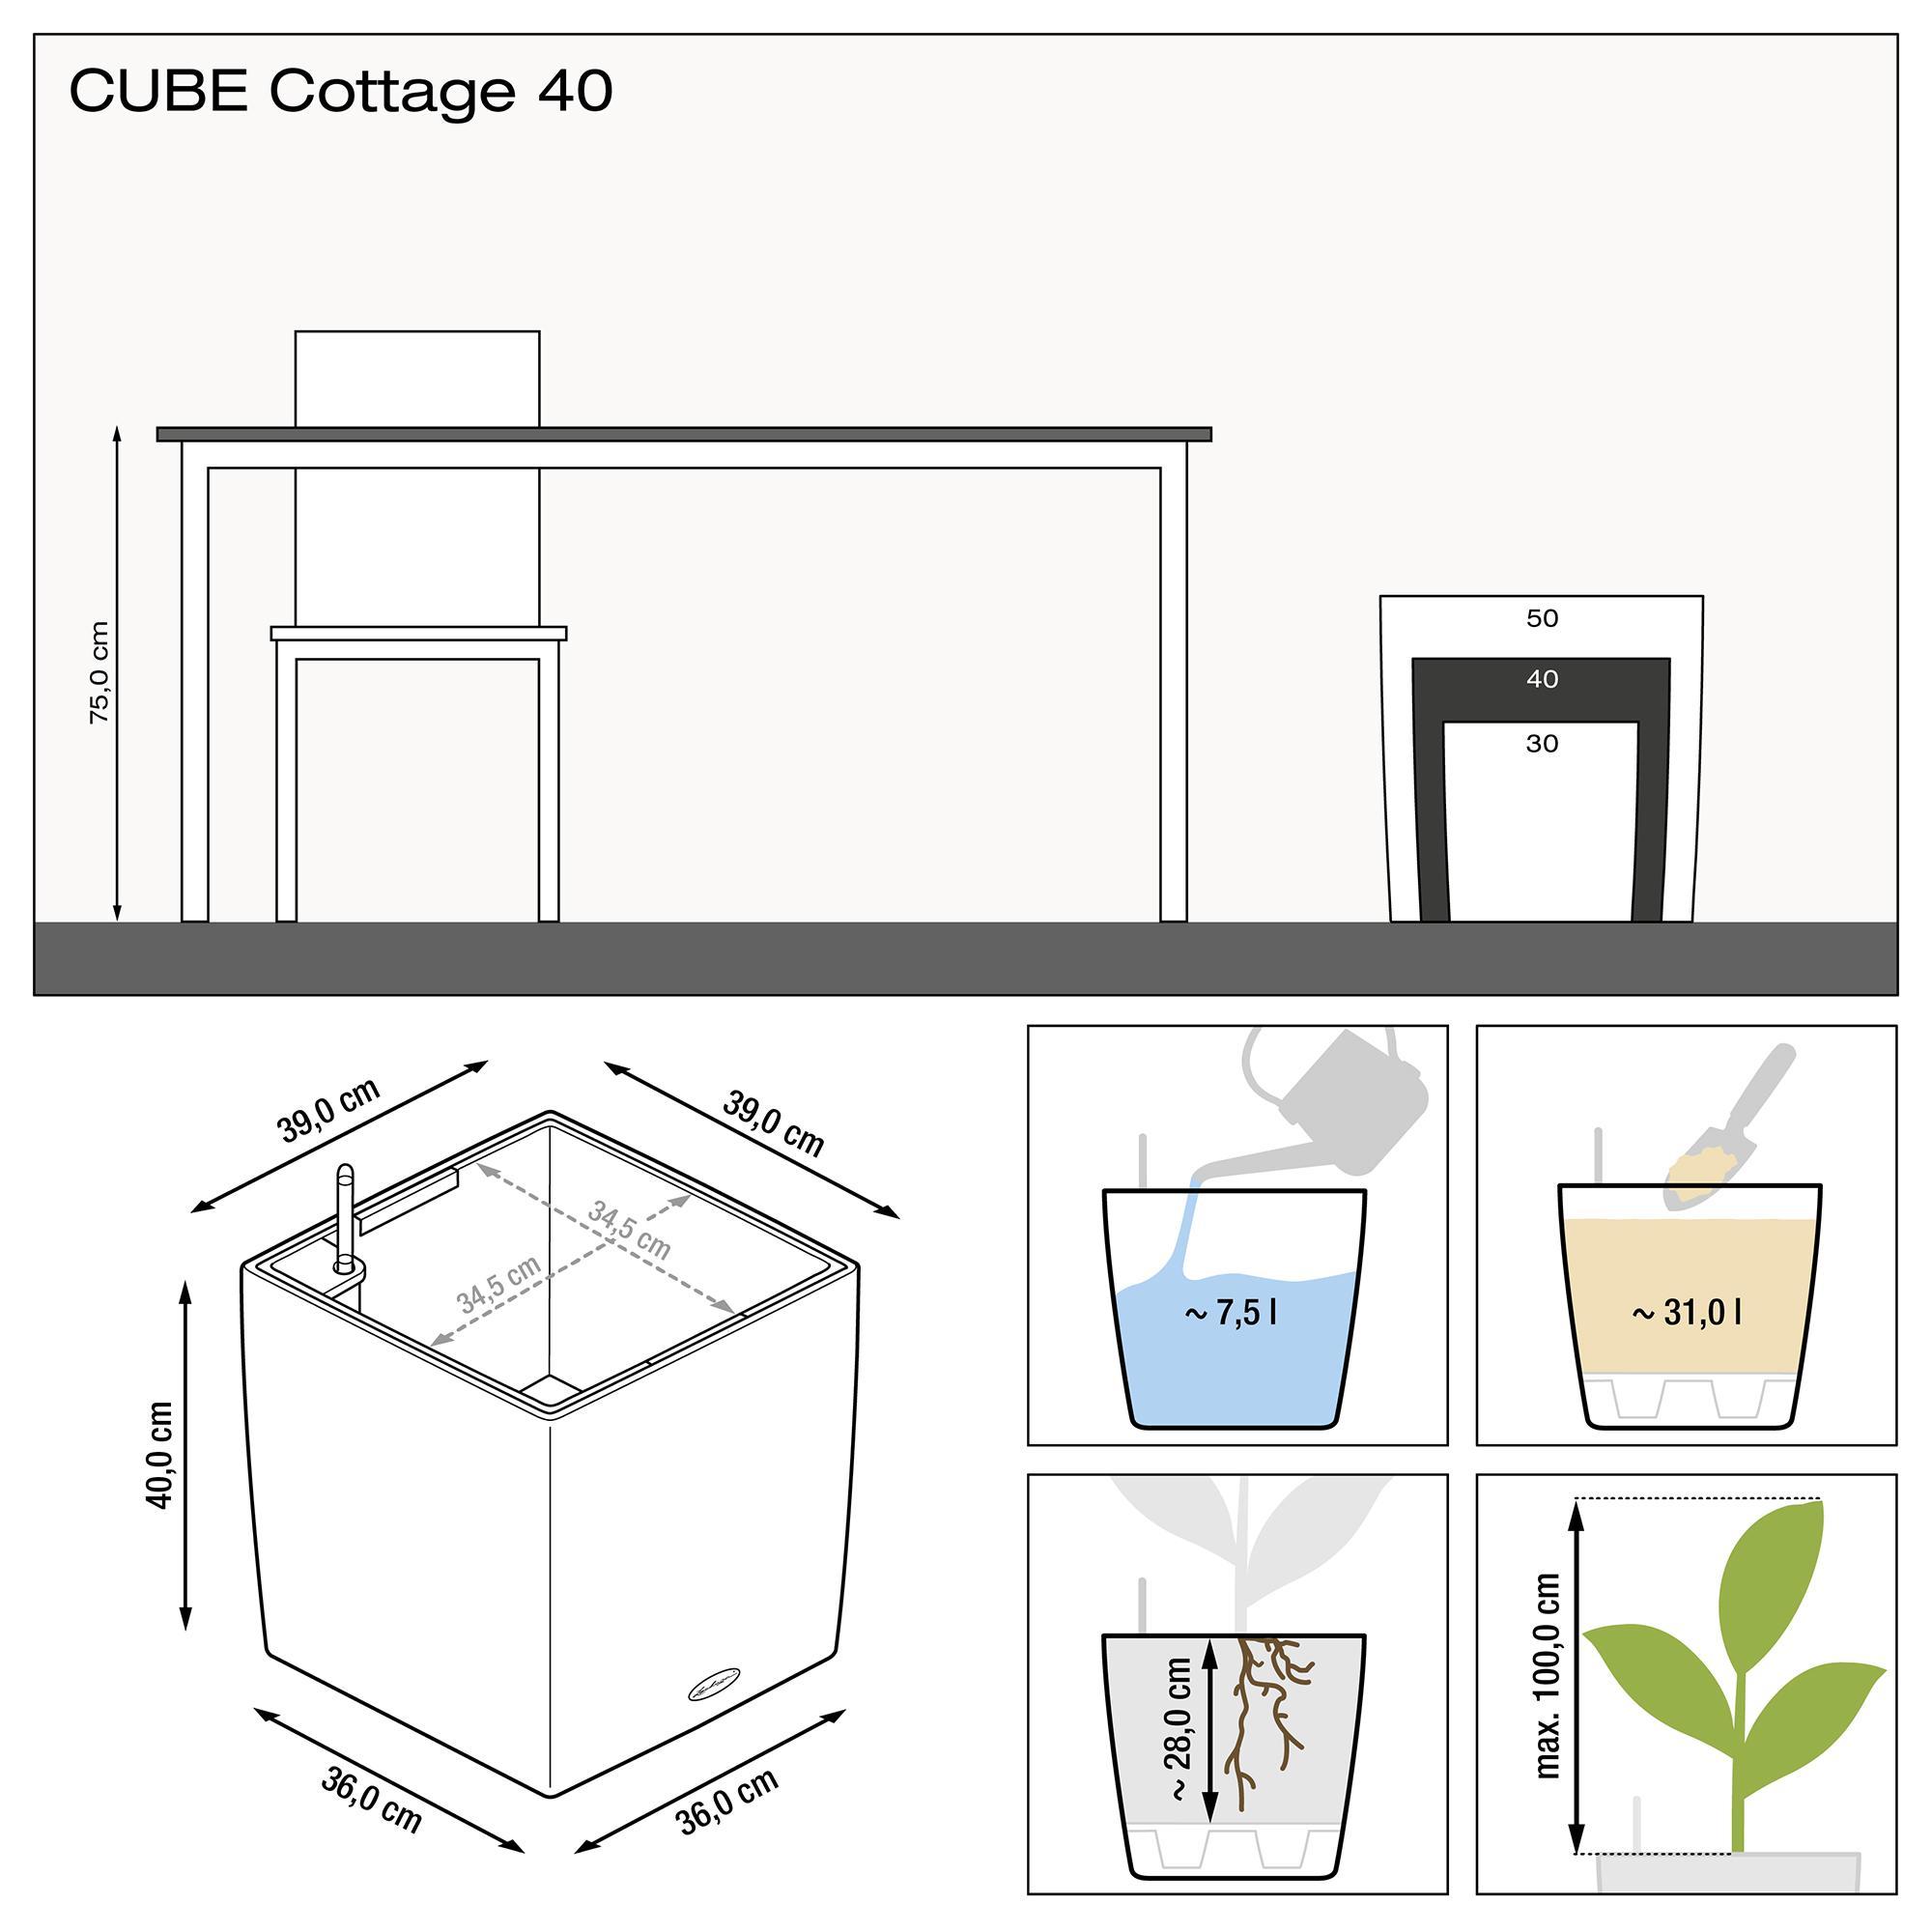 CUBE Cottage 40 mokka - Bild 3